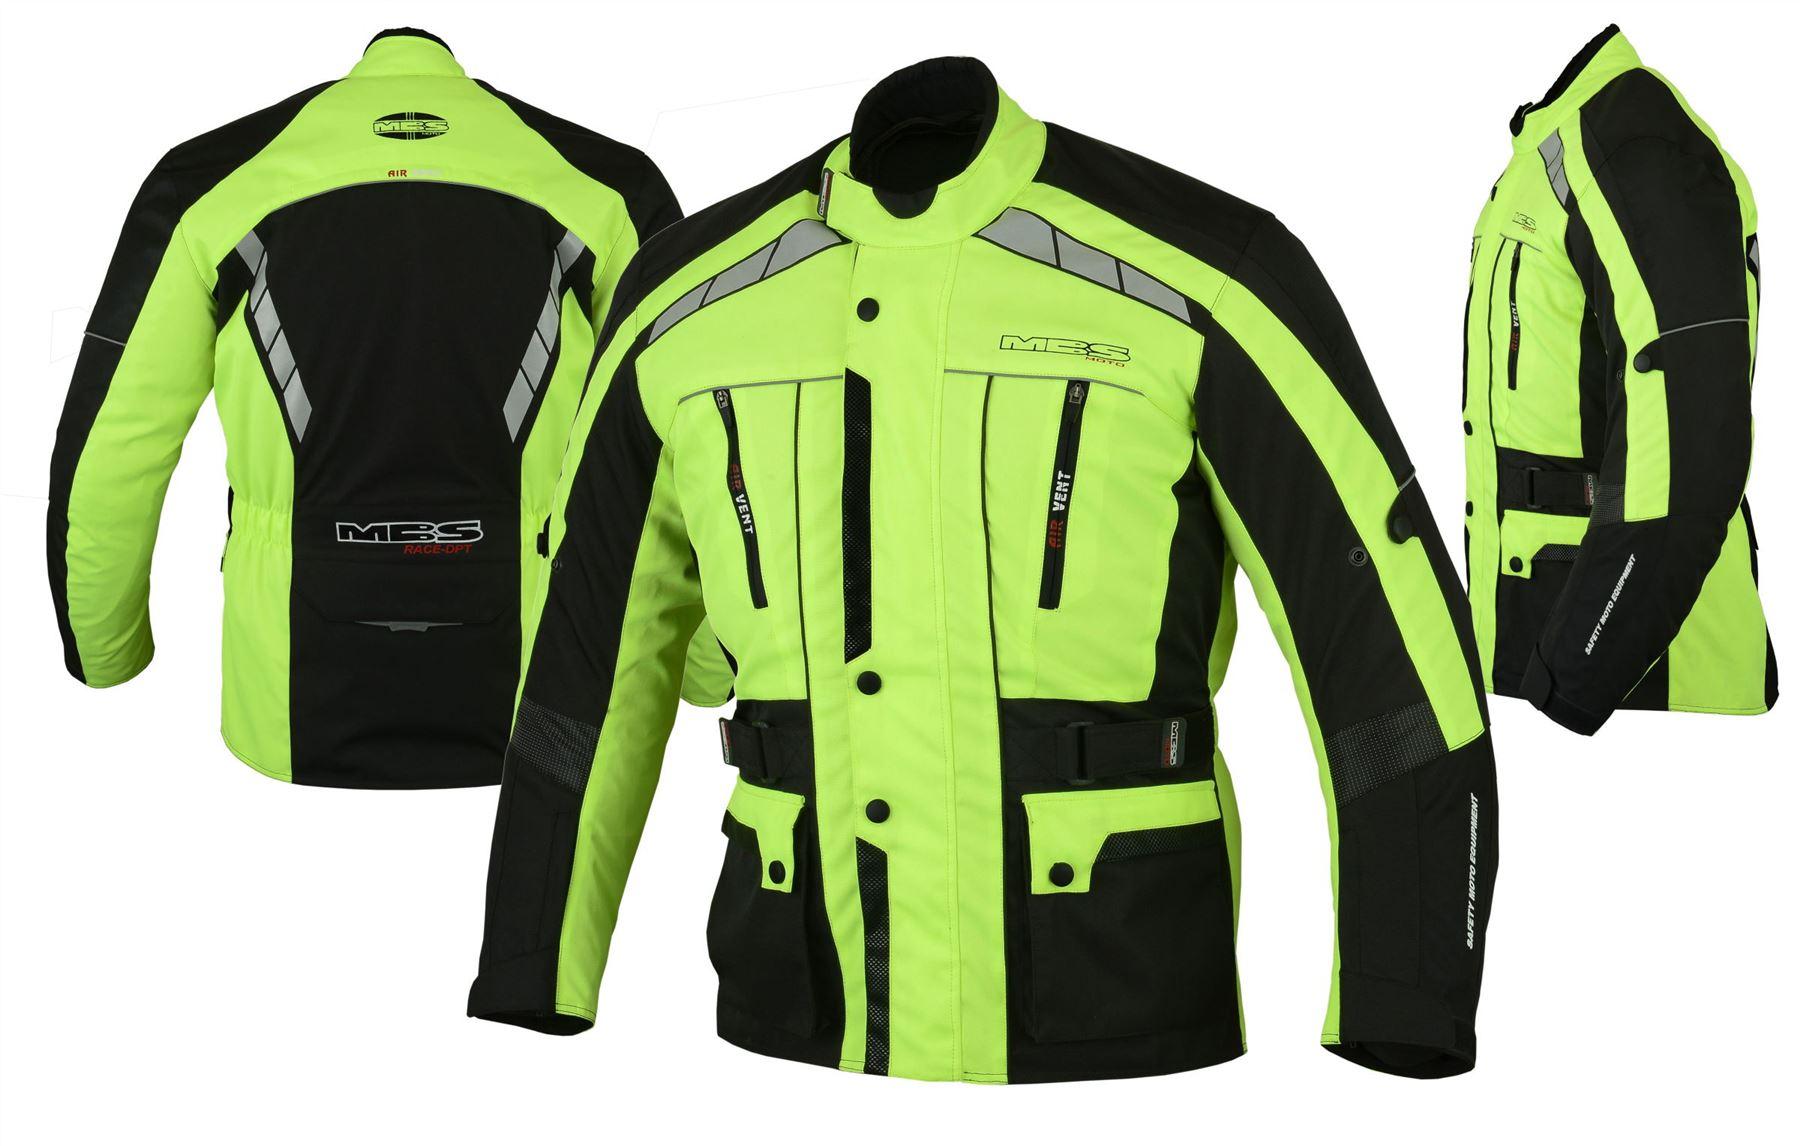 MBSmoto-James-Touring-Motorcycle-Motorbike-Waterproof-Textile-Protection-Jacket